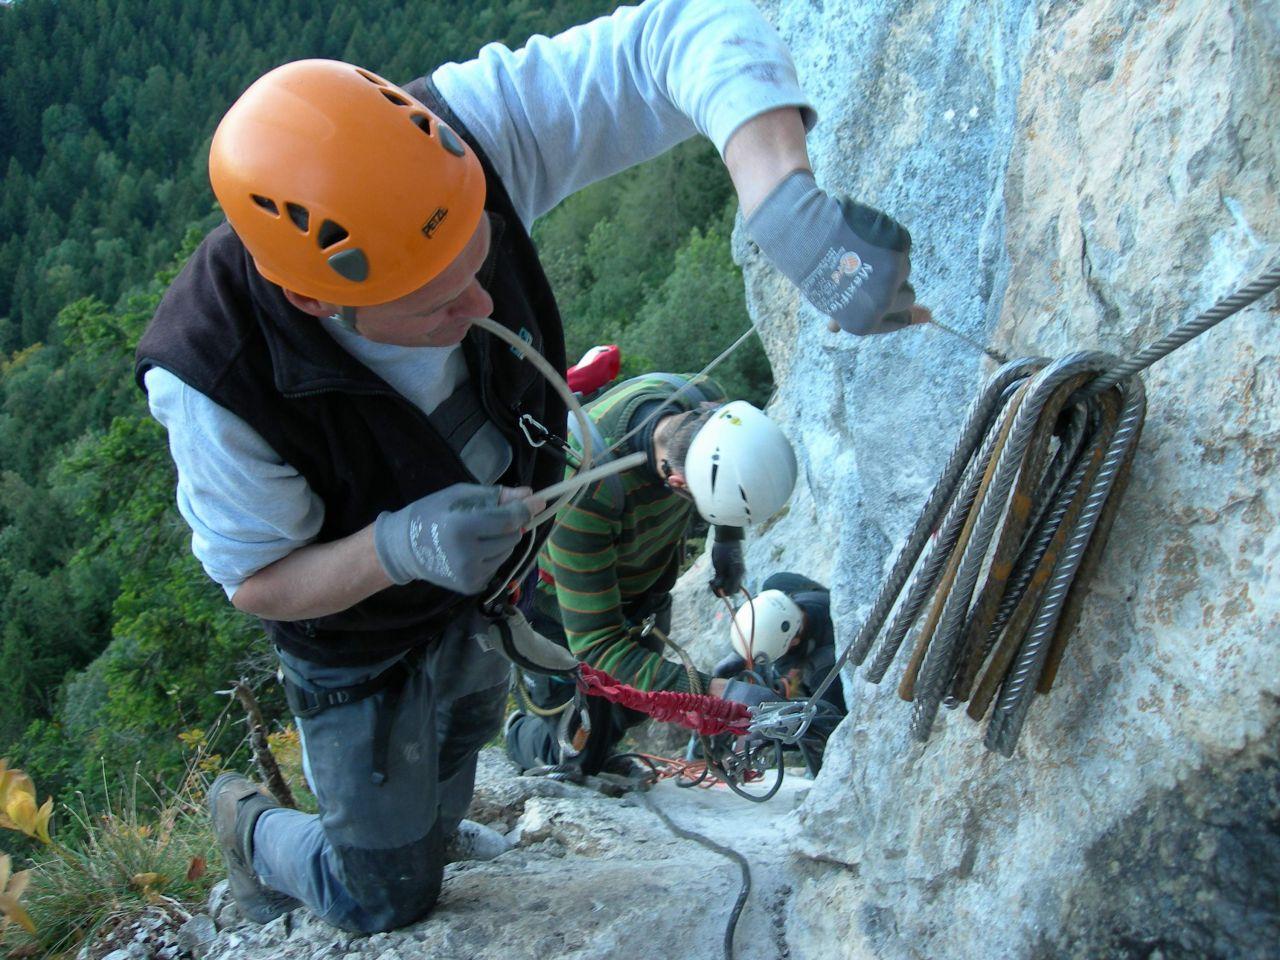 Klettersteig Via Kapf : Klettersteige kapf und kessi alpenverein